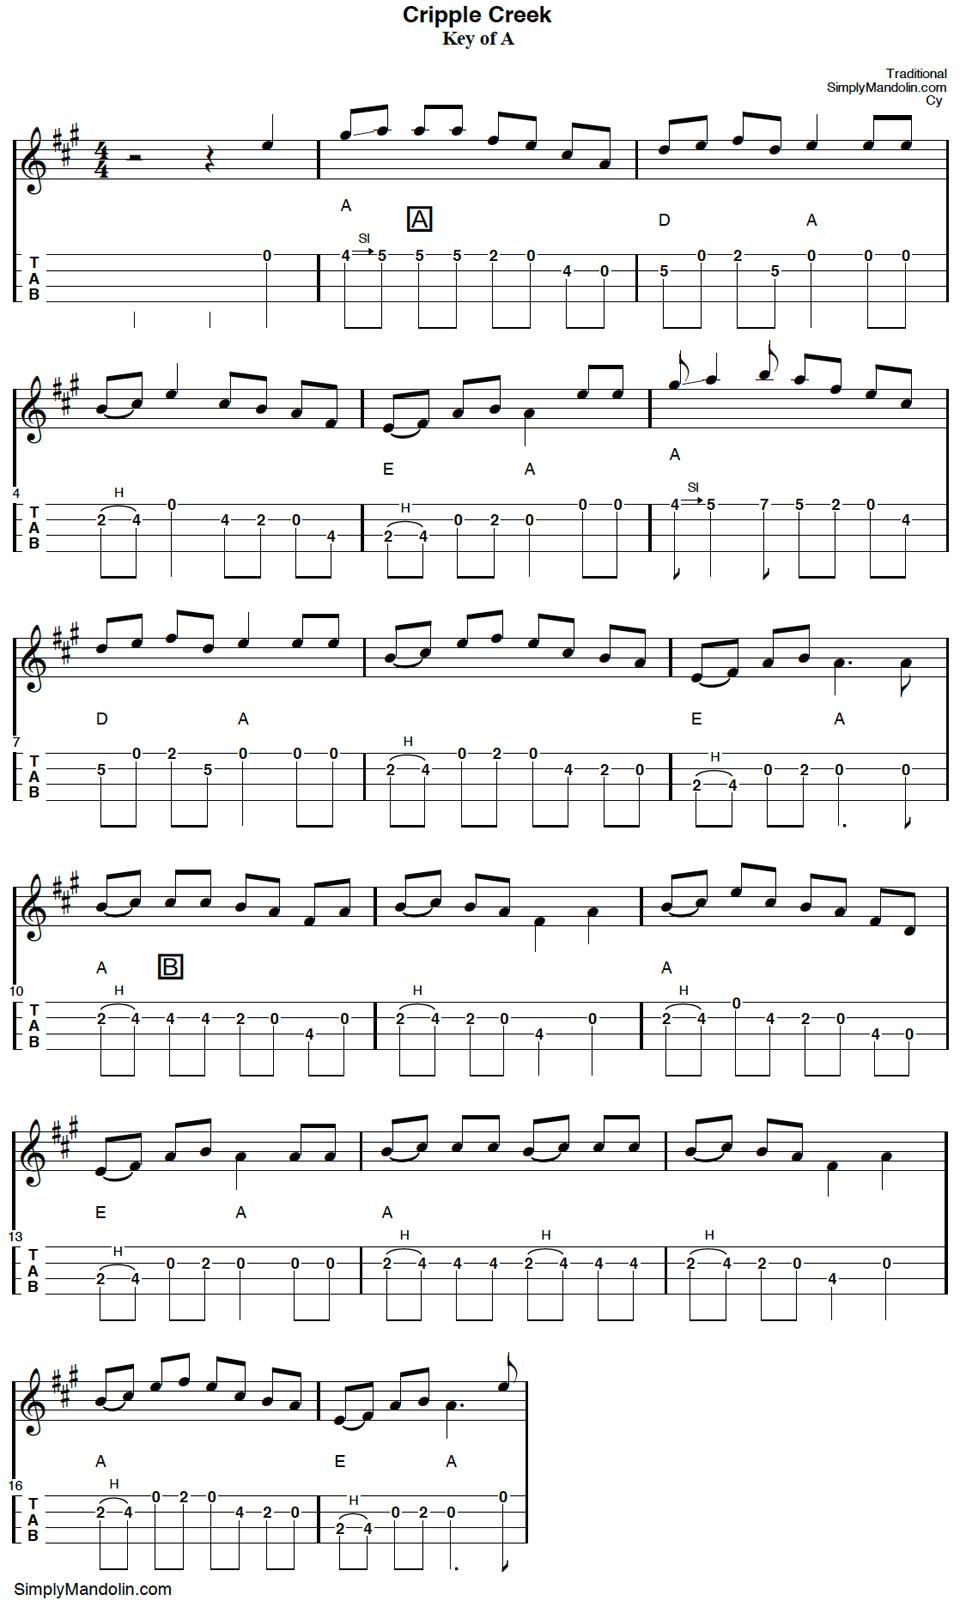 Cripple Creek - free mandolin tab and music - SimplyMandolin